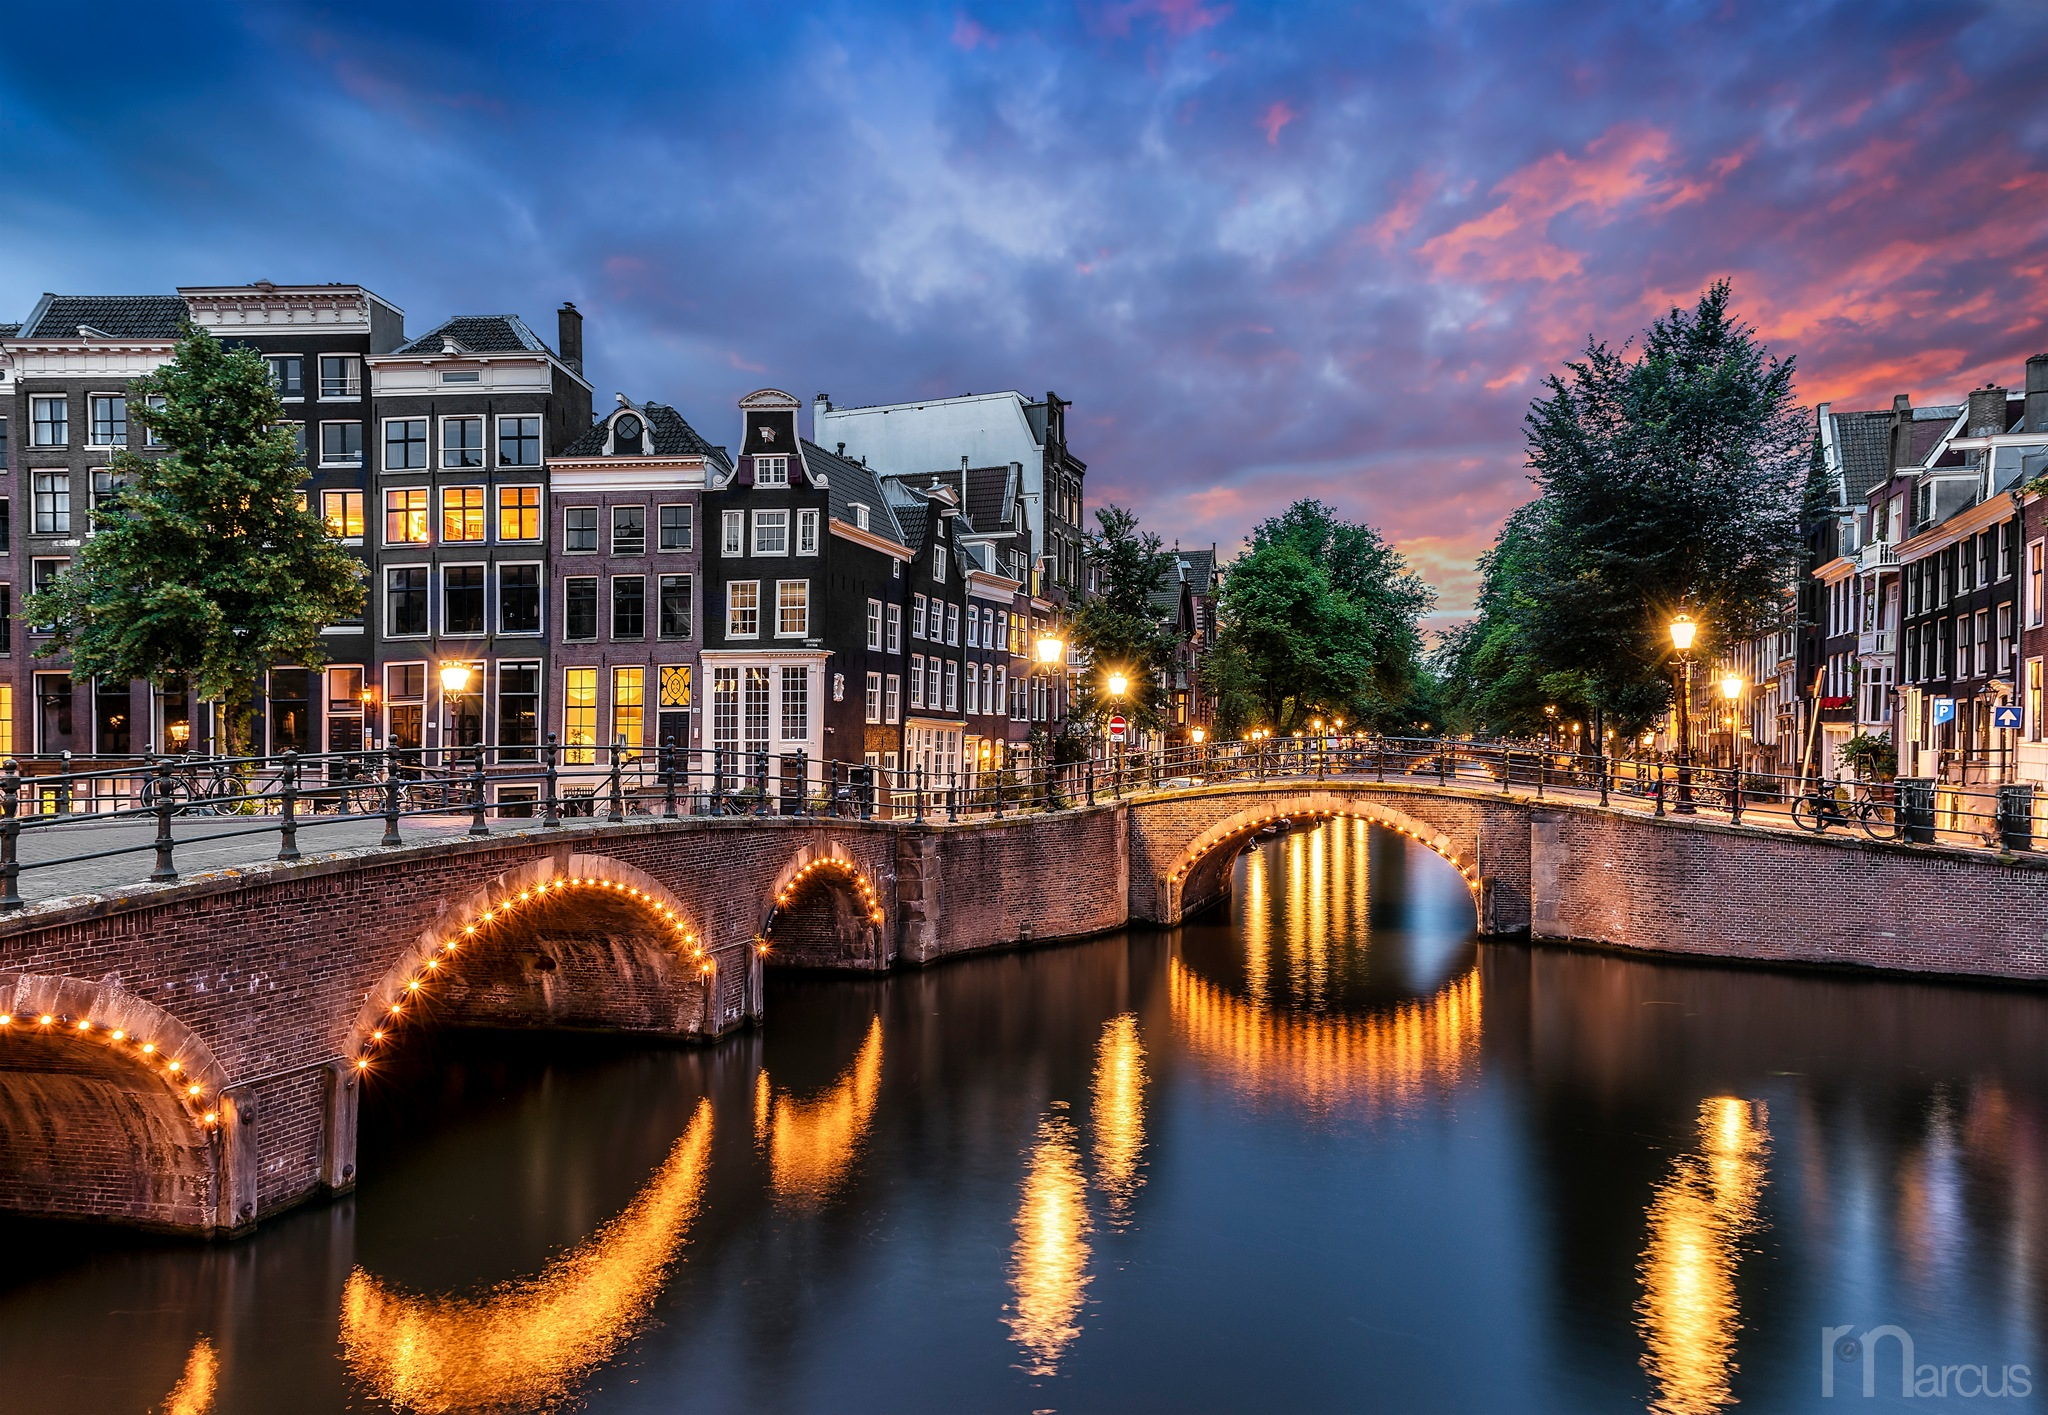 Bridges of Amsterdam by ⭐️ Richard Marcus